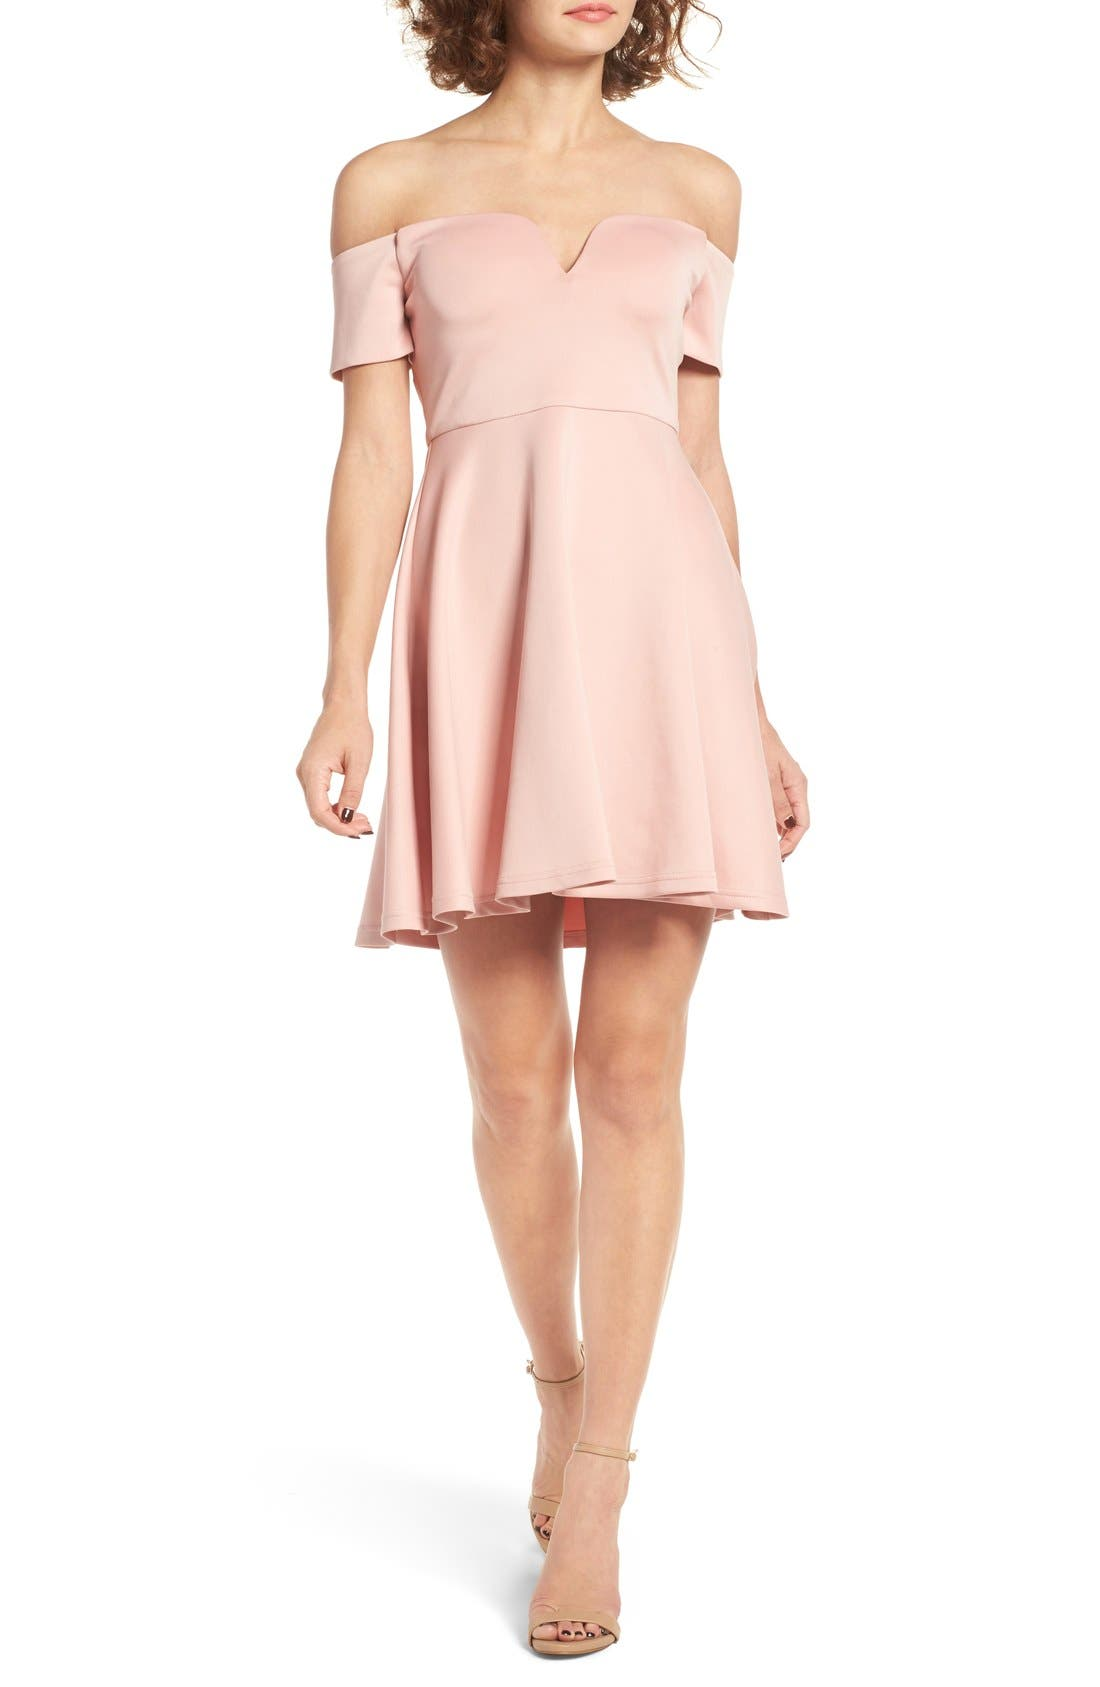 Alternate Image 1 Selected - Cream & Sugar Sweetheart Off the Shoulder Dress